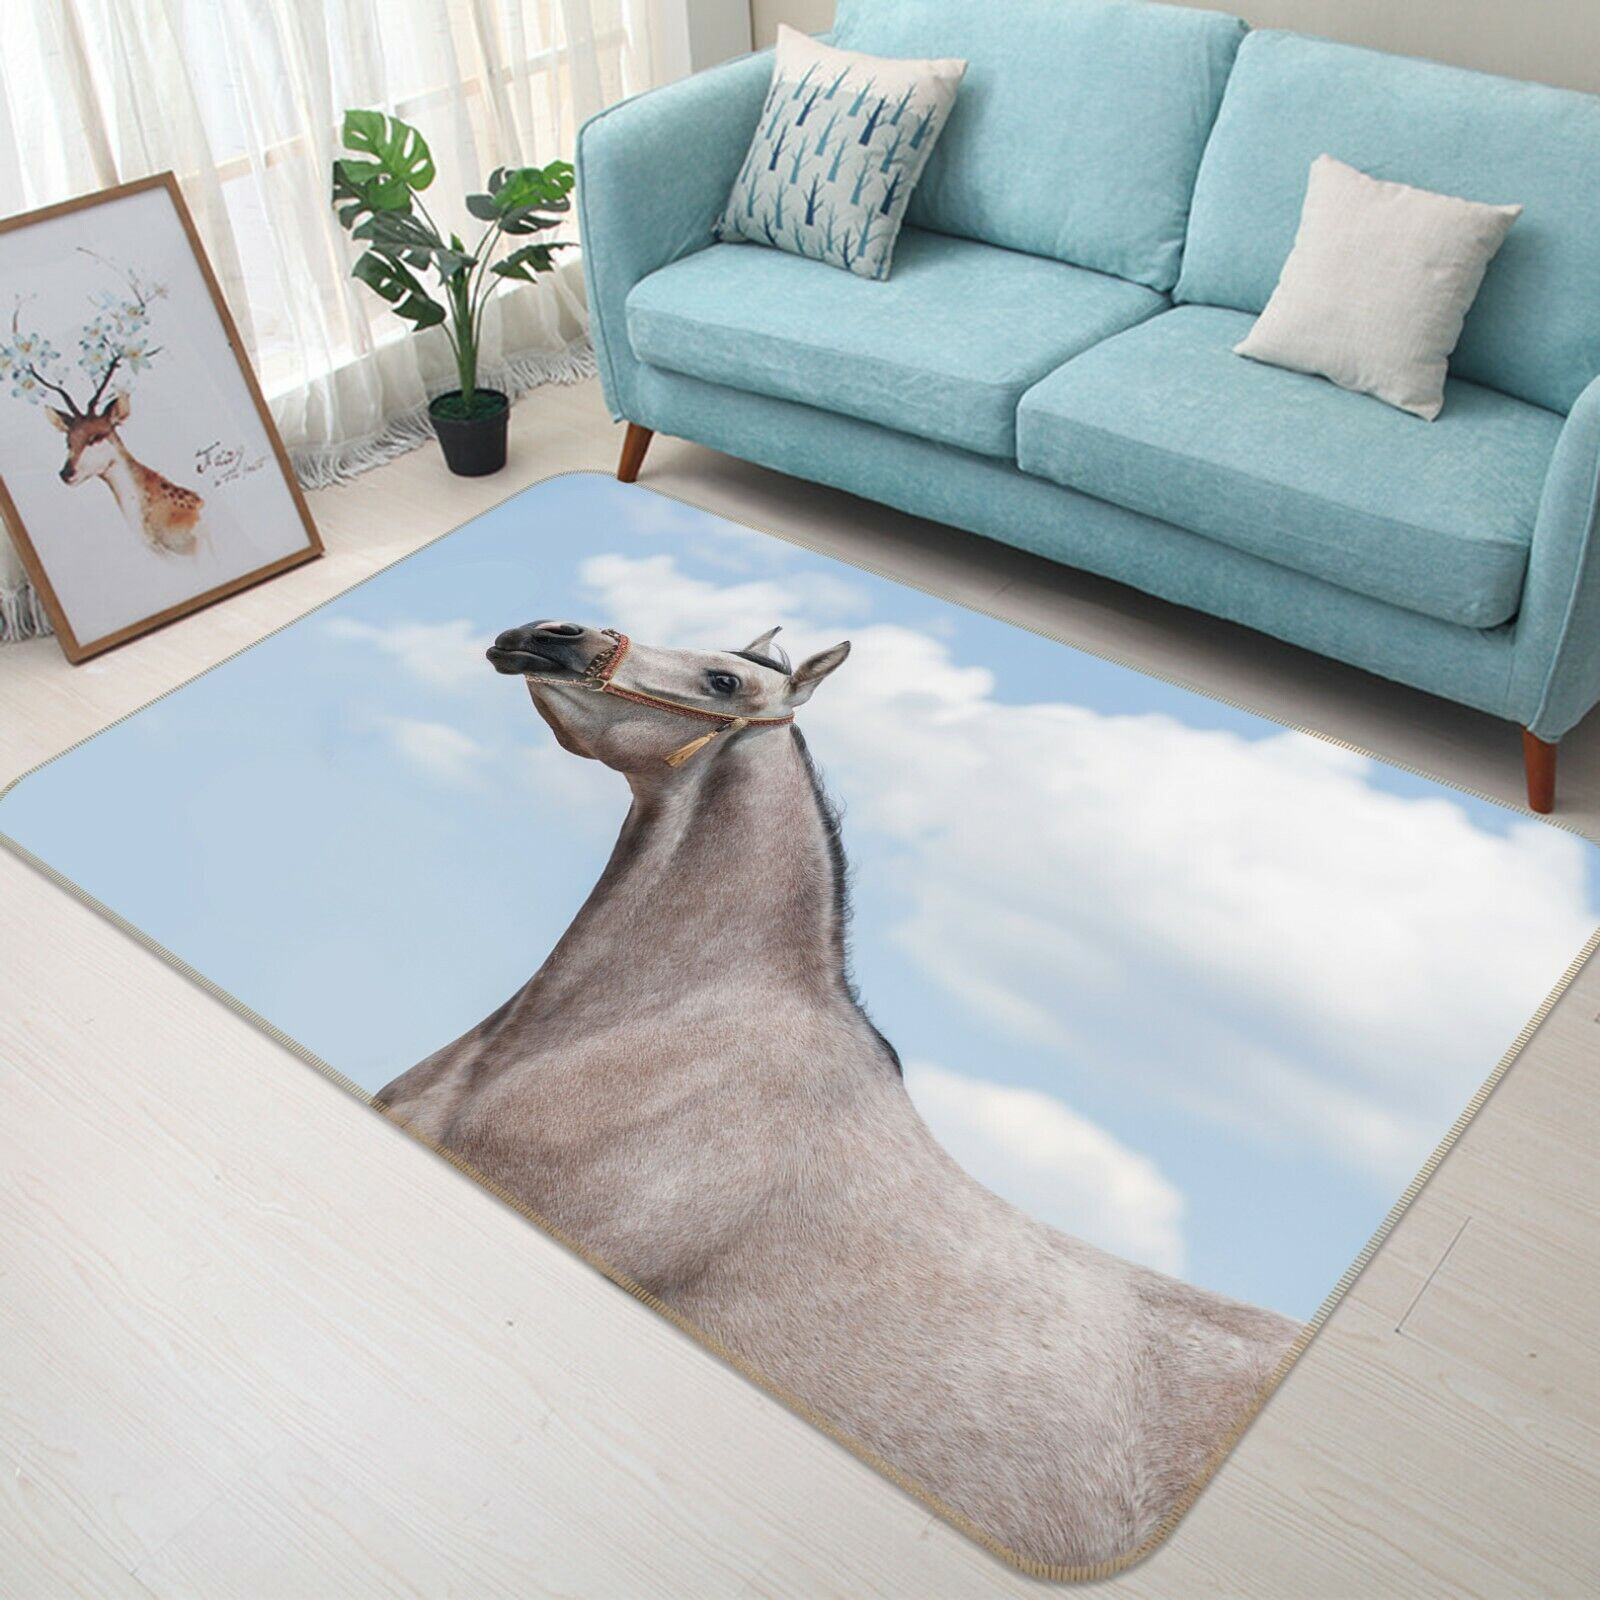 3d blancoo caballo a068 animal juego antideslizante maletero elegante foto alfombra Wendy